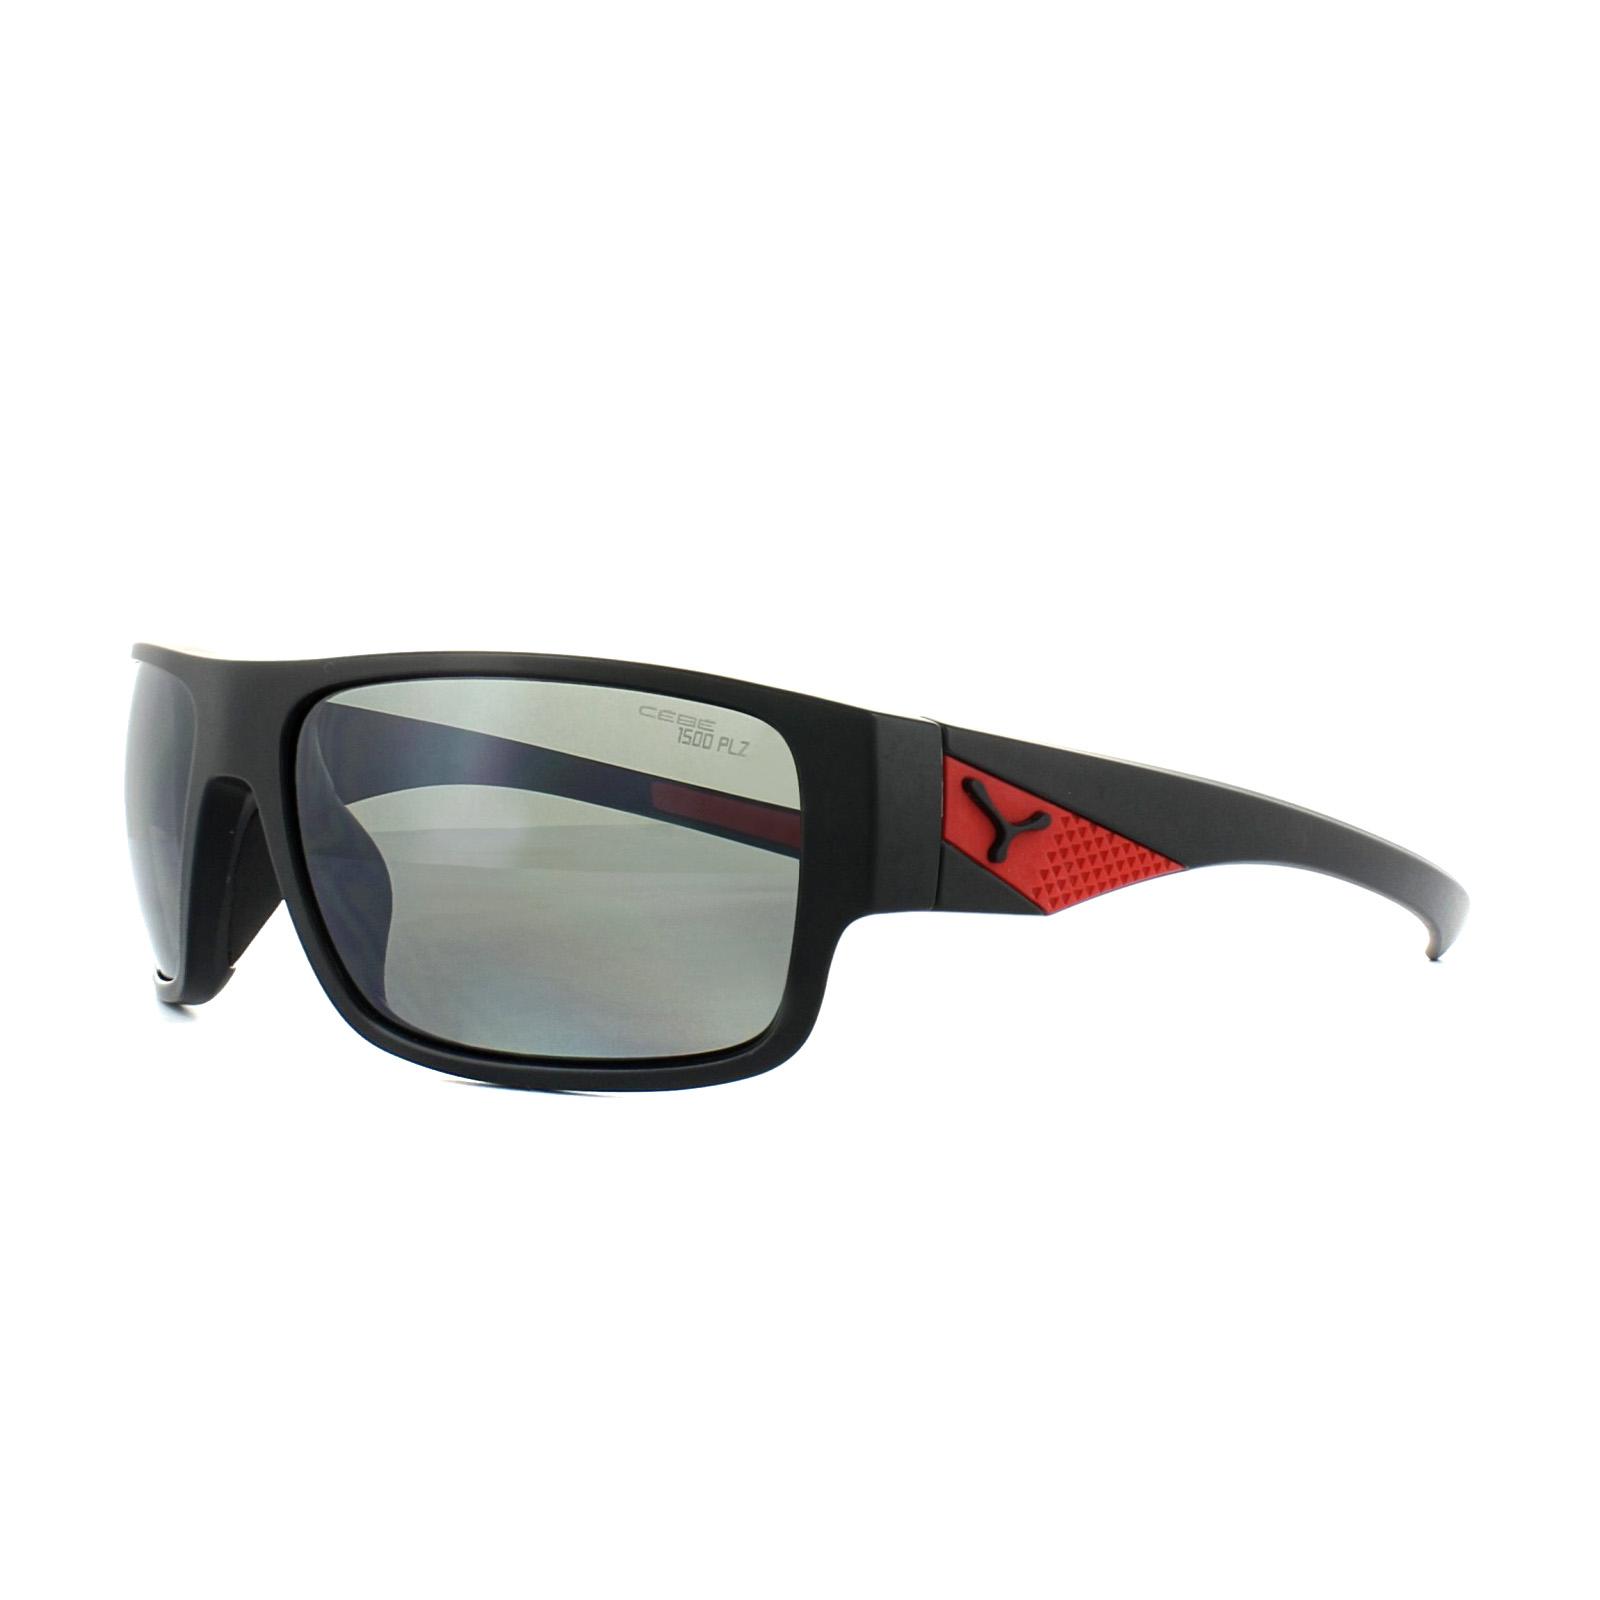 3b78afd49cd2c6 Sentinel Cebe Sunglasses Whisper CBWHISP4 Black Red Grey 1500 AR Silver  Mirror Polarized